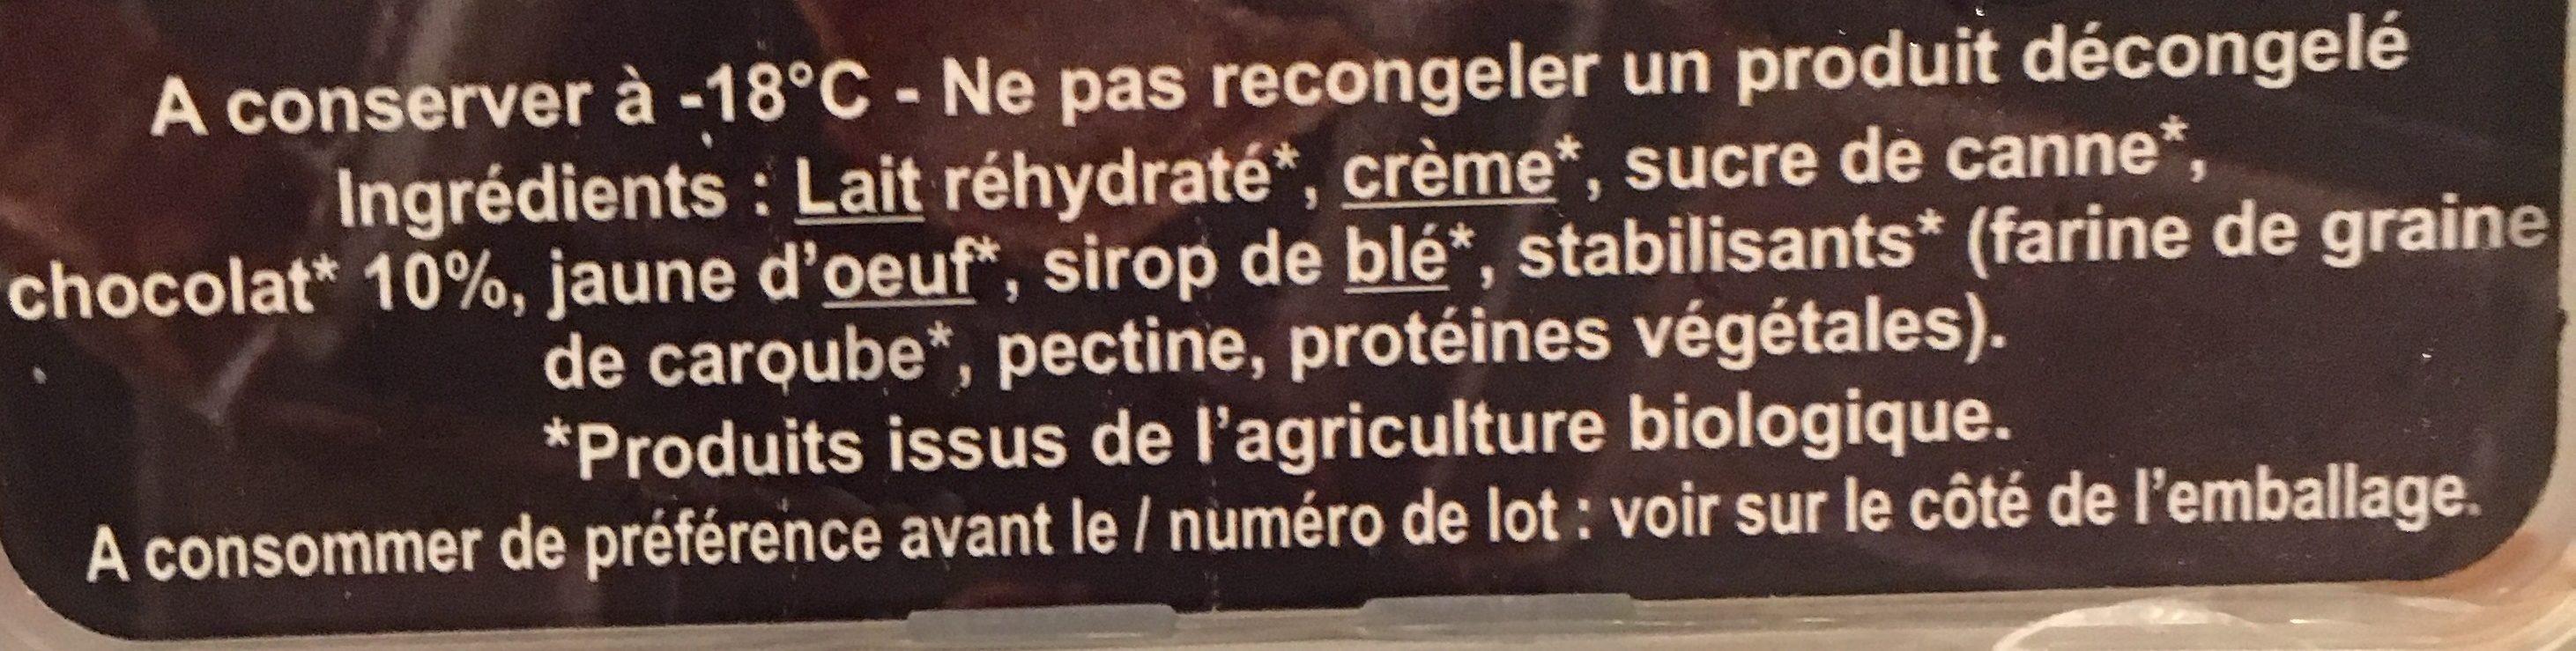 Glace chocolat bio - Ingrédients - fr